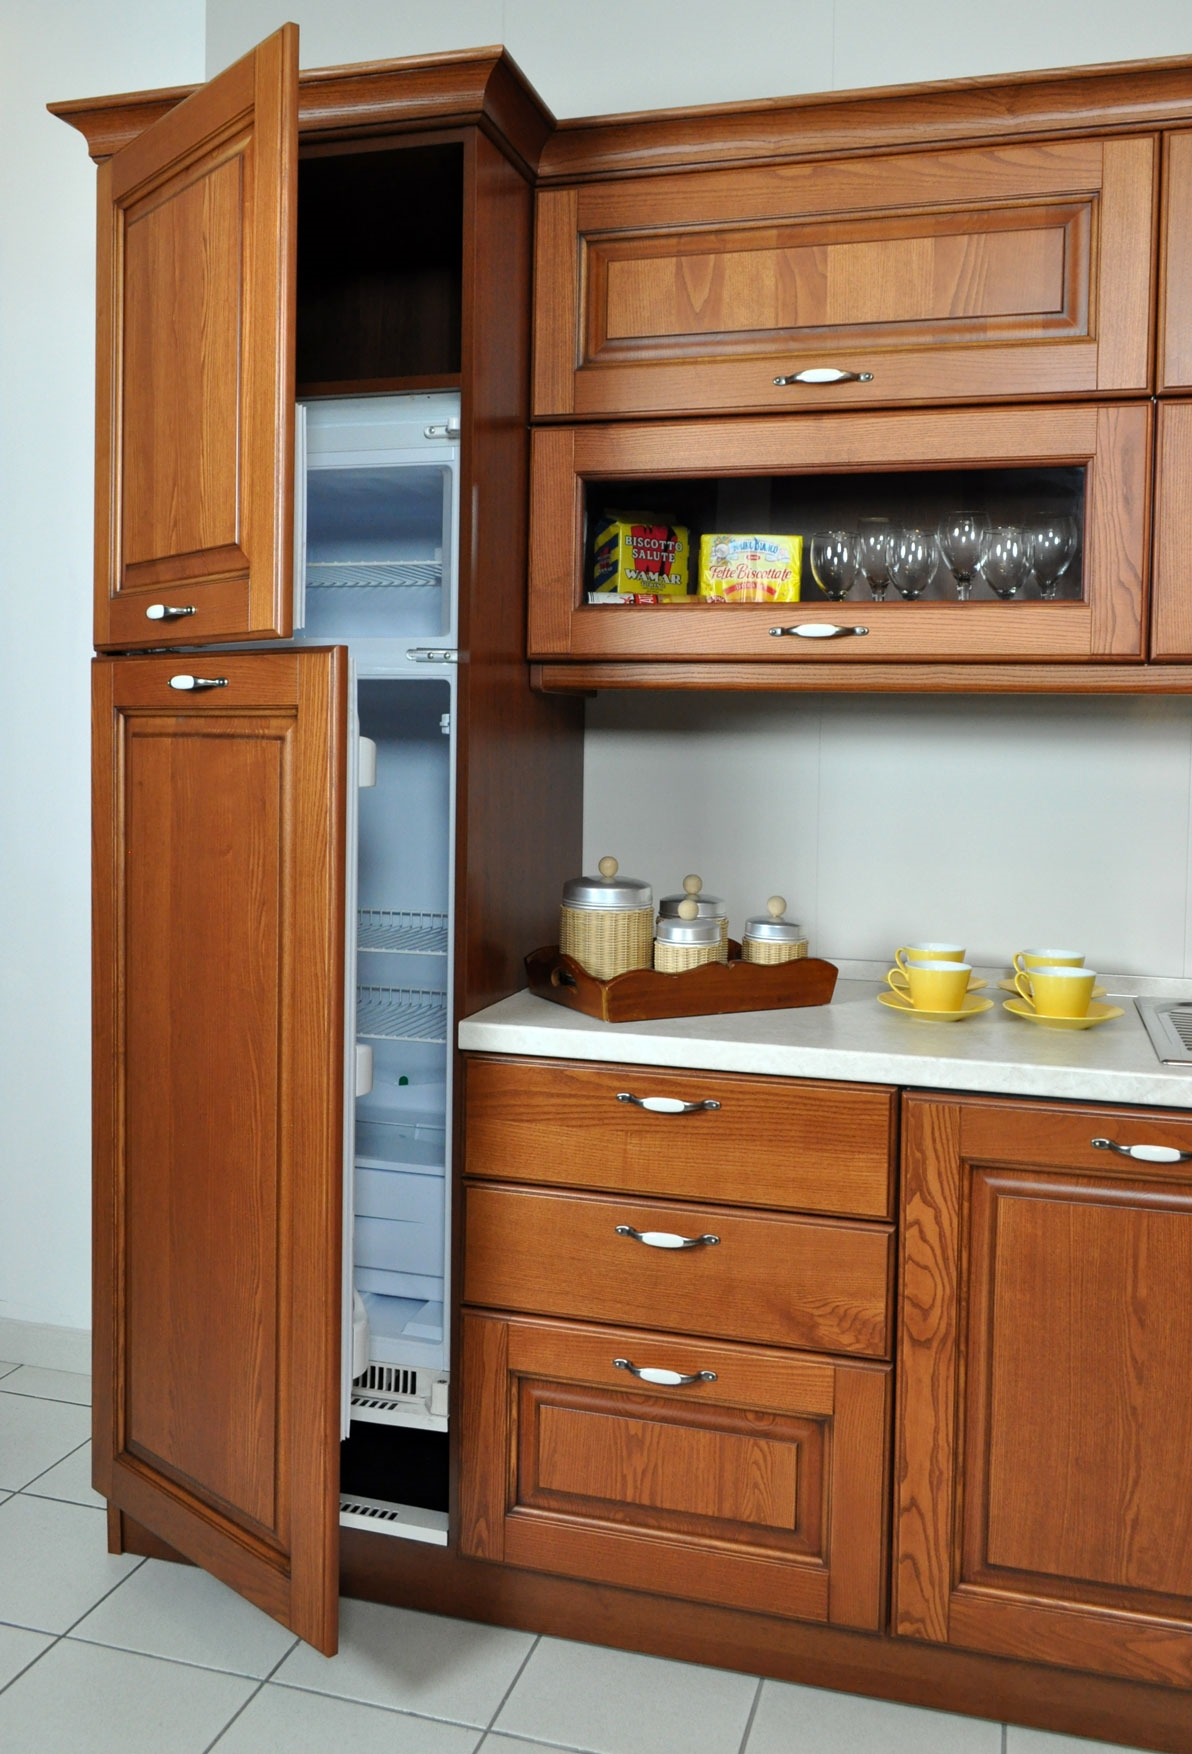 Cucina angolare veneta cucine con elettrodomestici - Disposizione elettrodomestici cucina ...